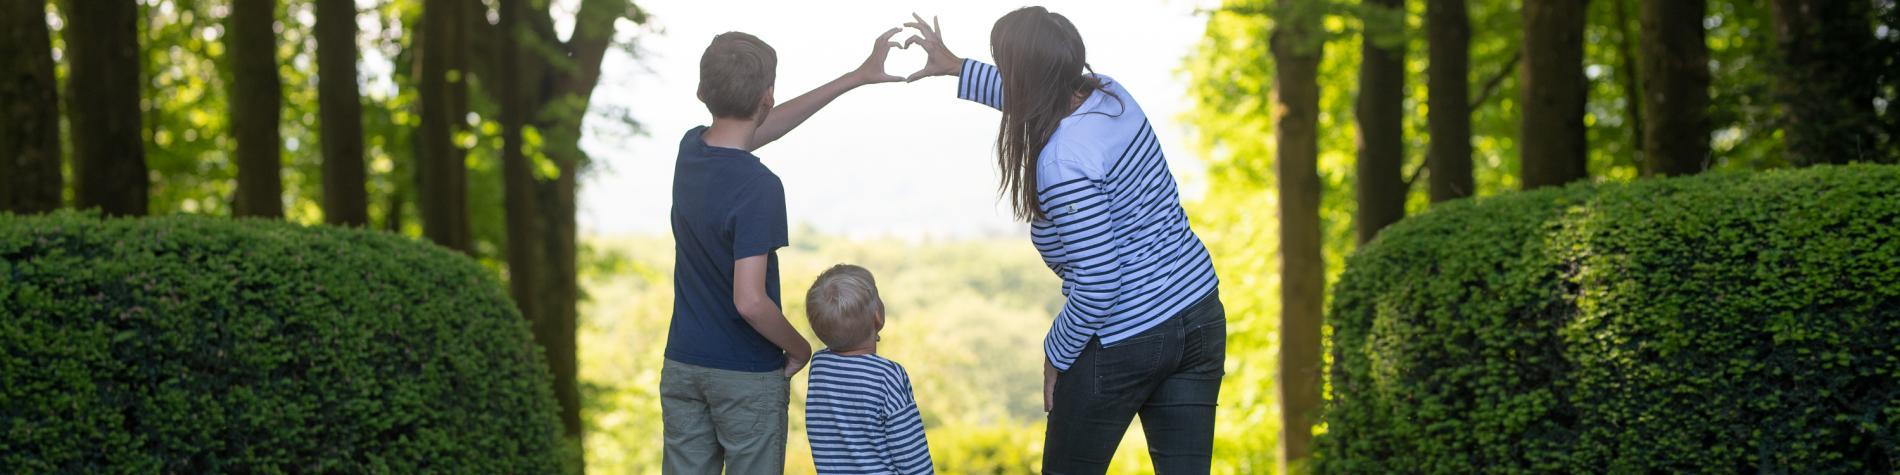 Famille en balade - MT Condroz-Famenne - Martin Dellicour